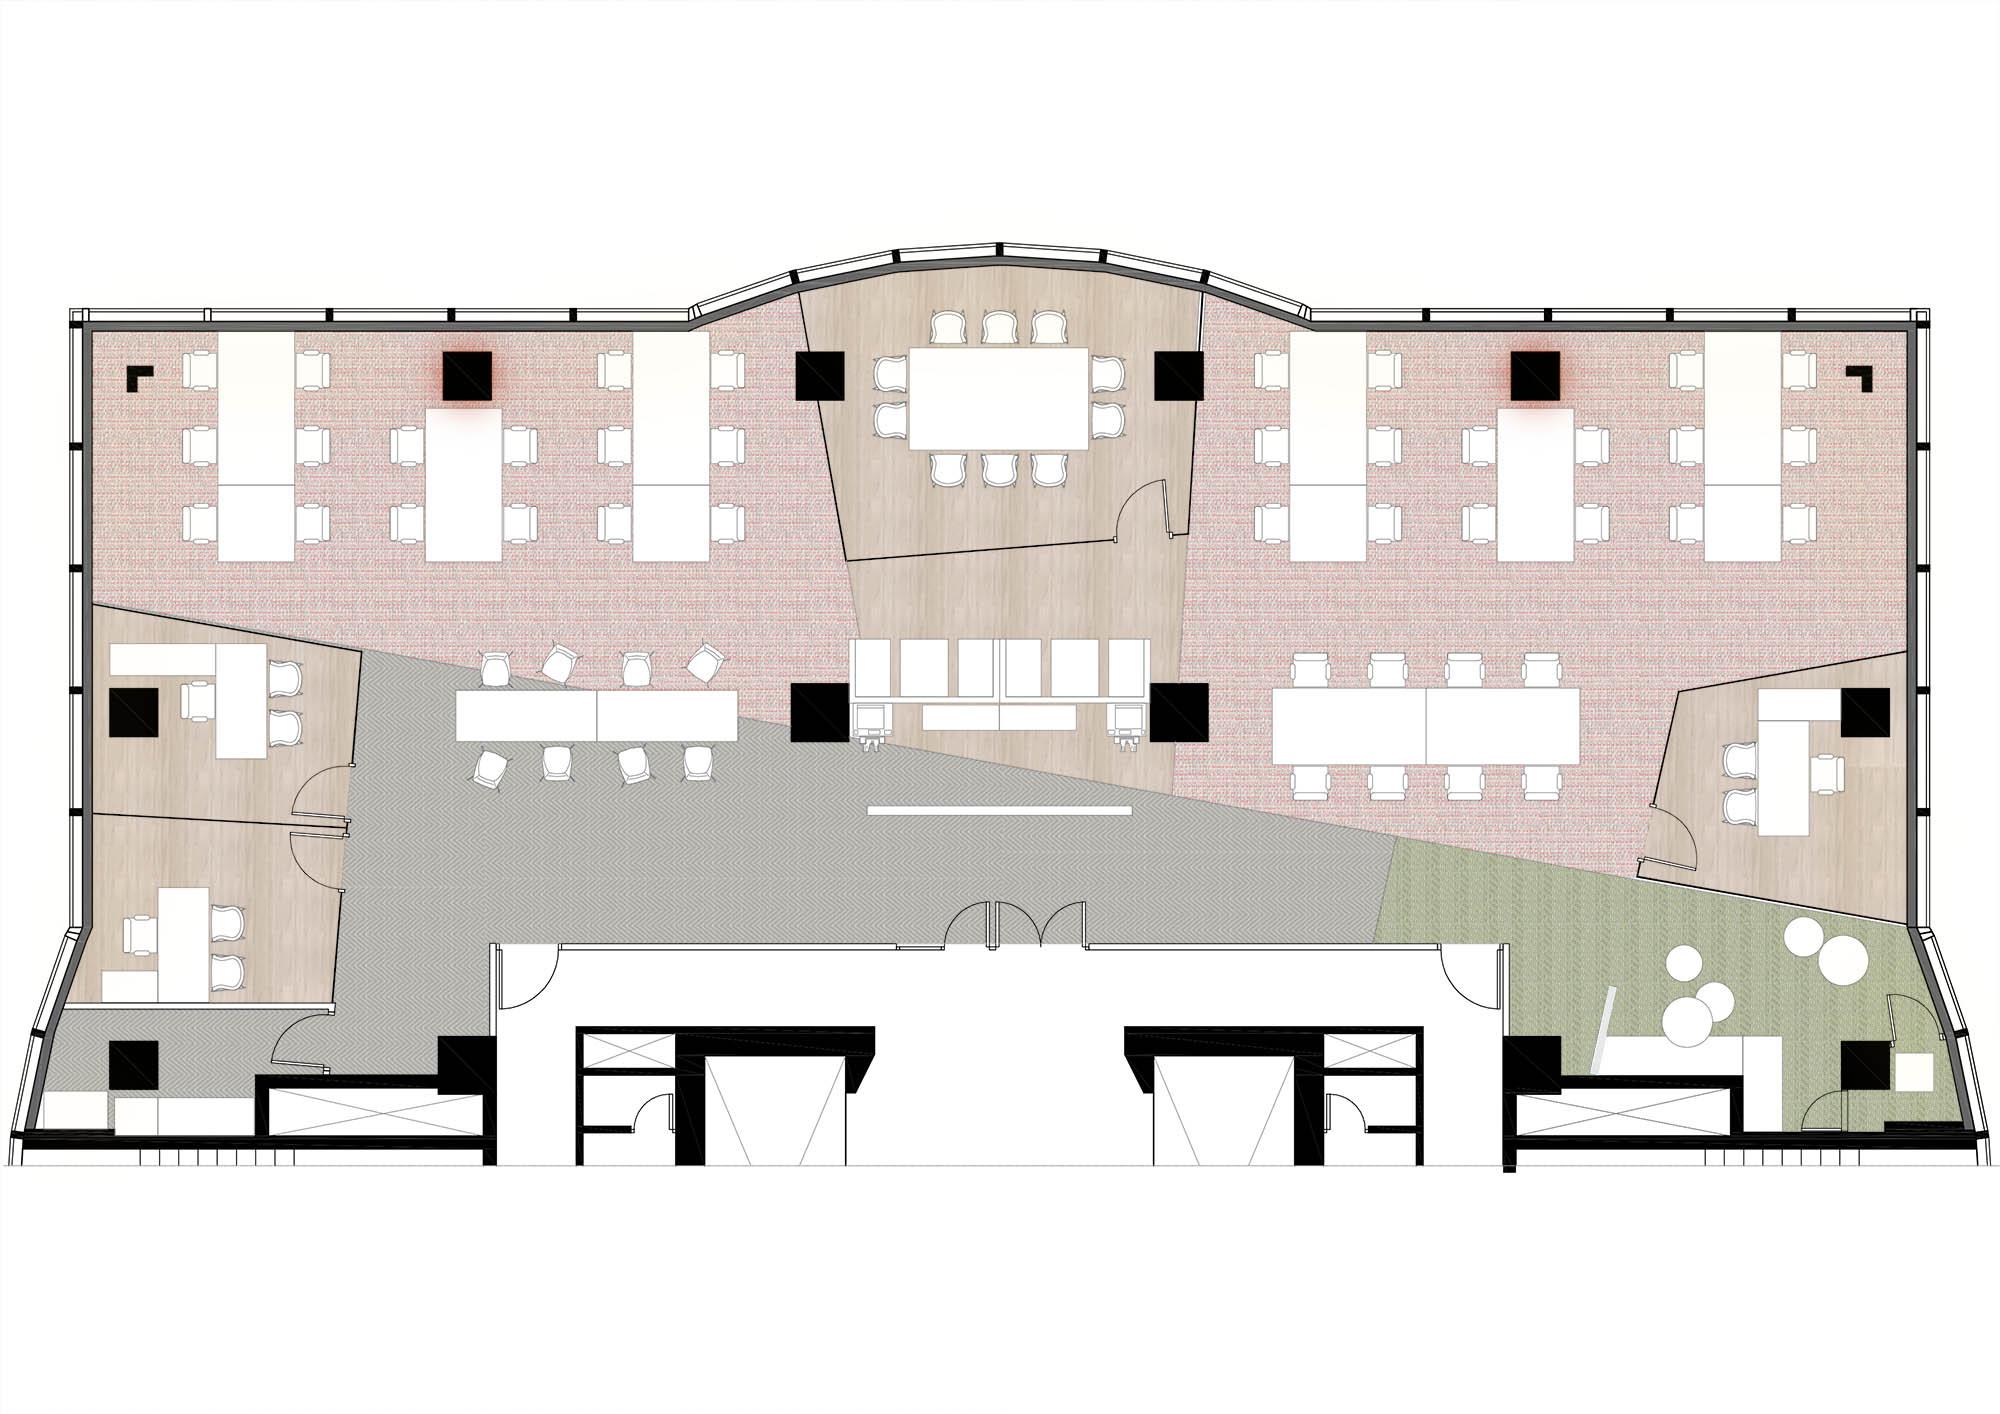 Plano UCI CENTRAL